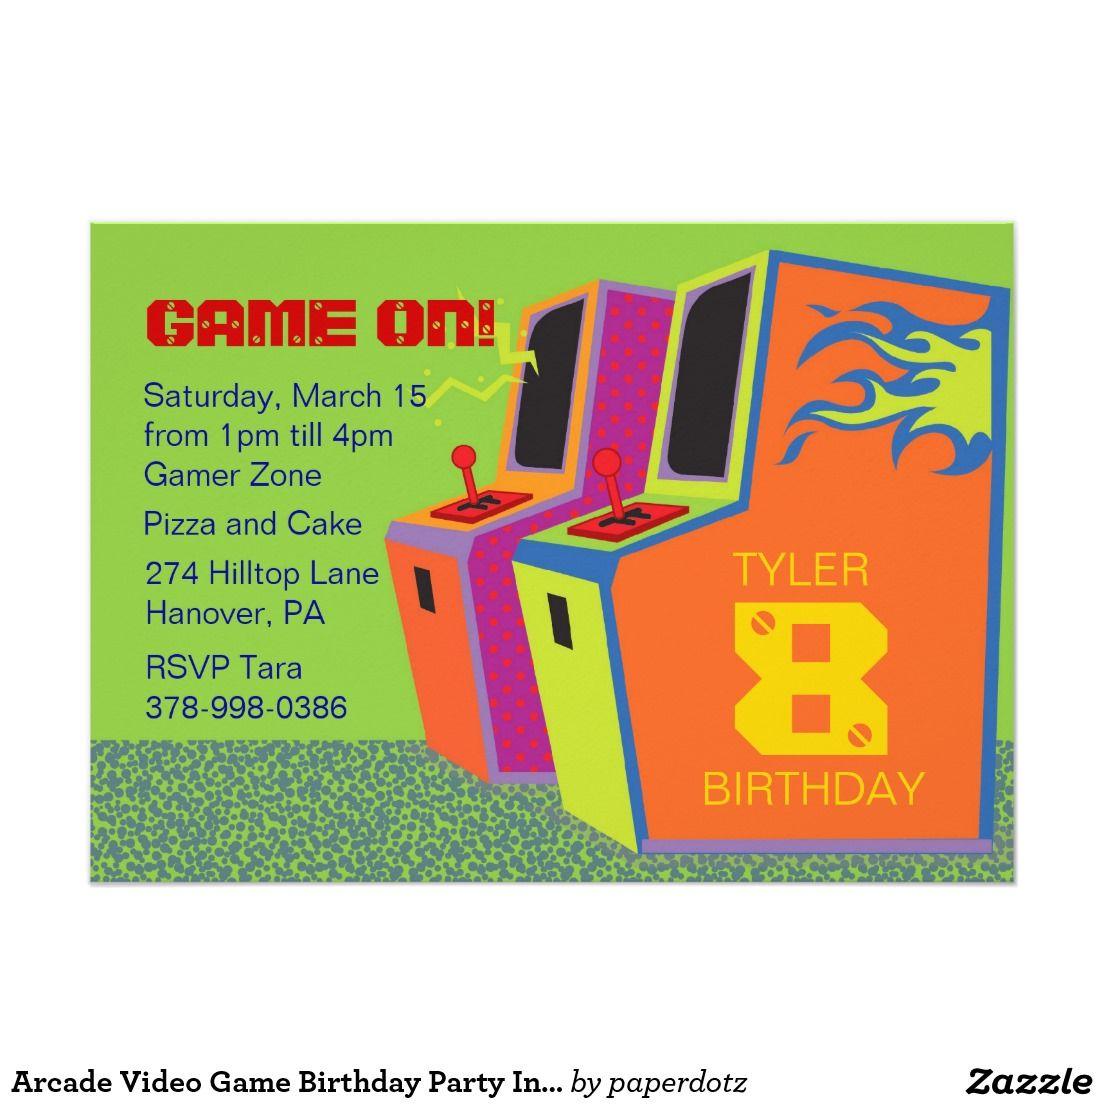 Arcade Video Game Birthday Party Invitations Invite Party